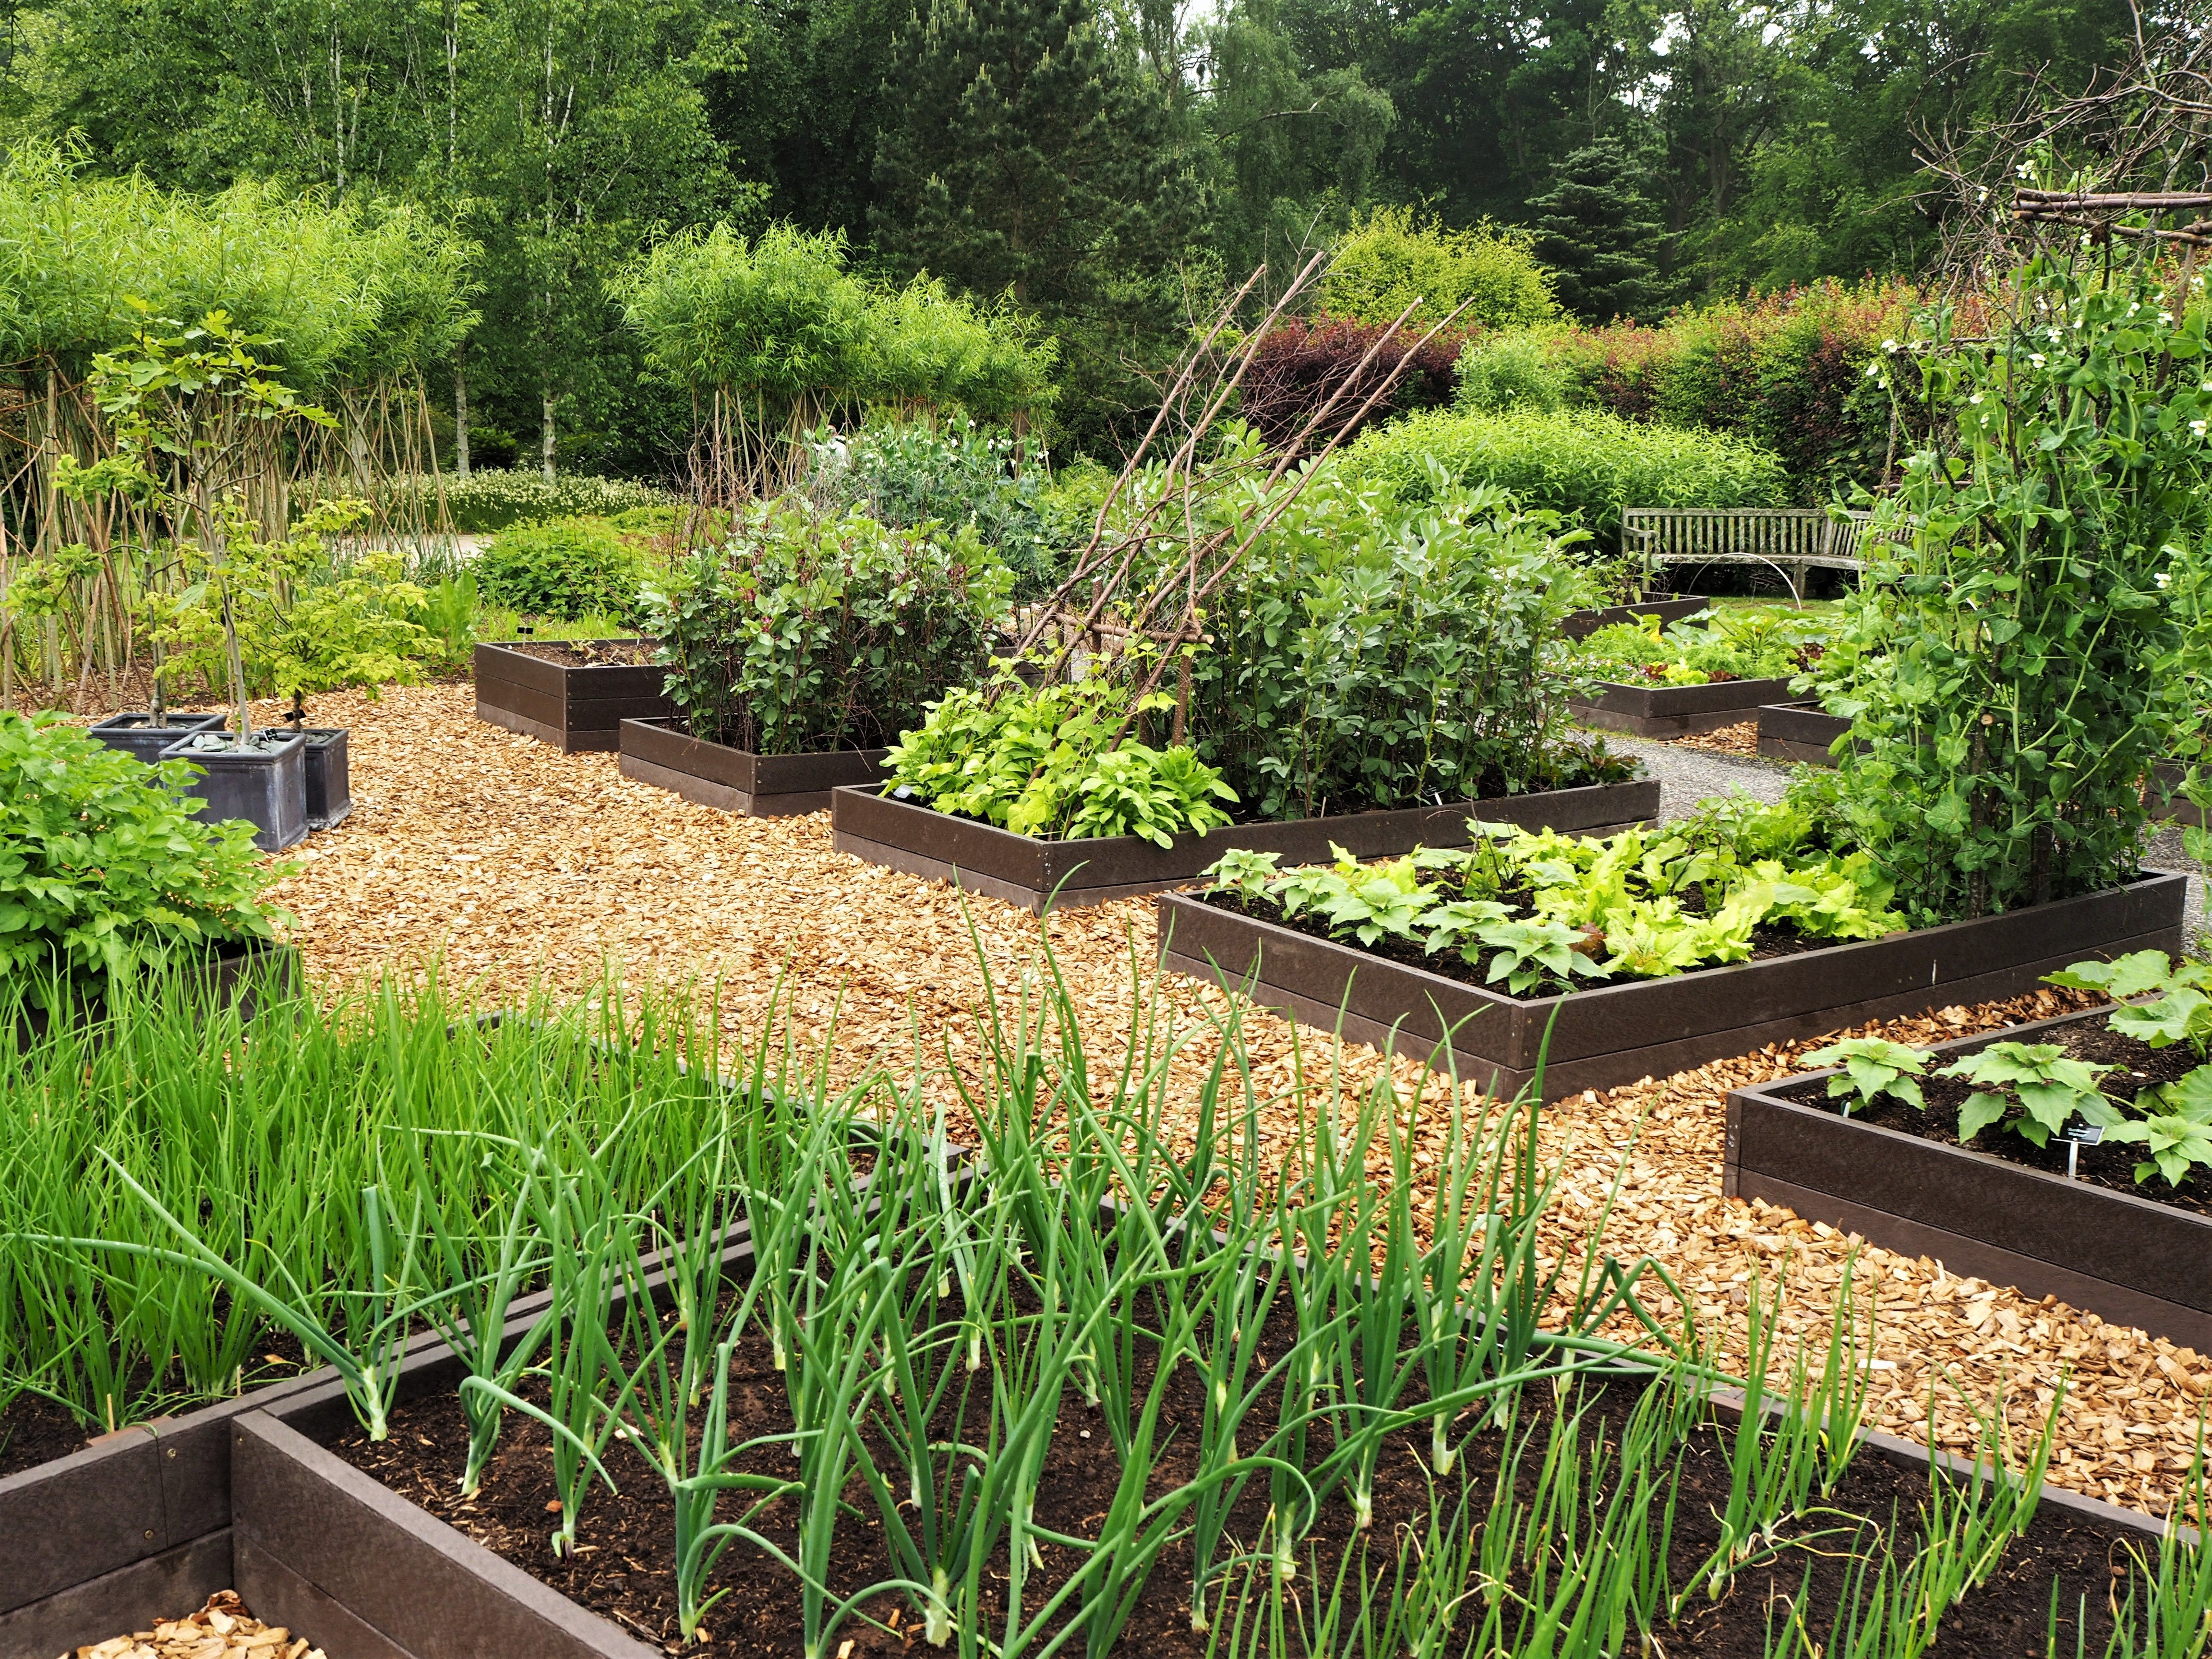 Harlow Carr Gardens, Harrogate - Self Arranged Journeys in ...